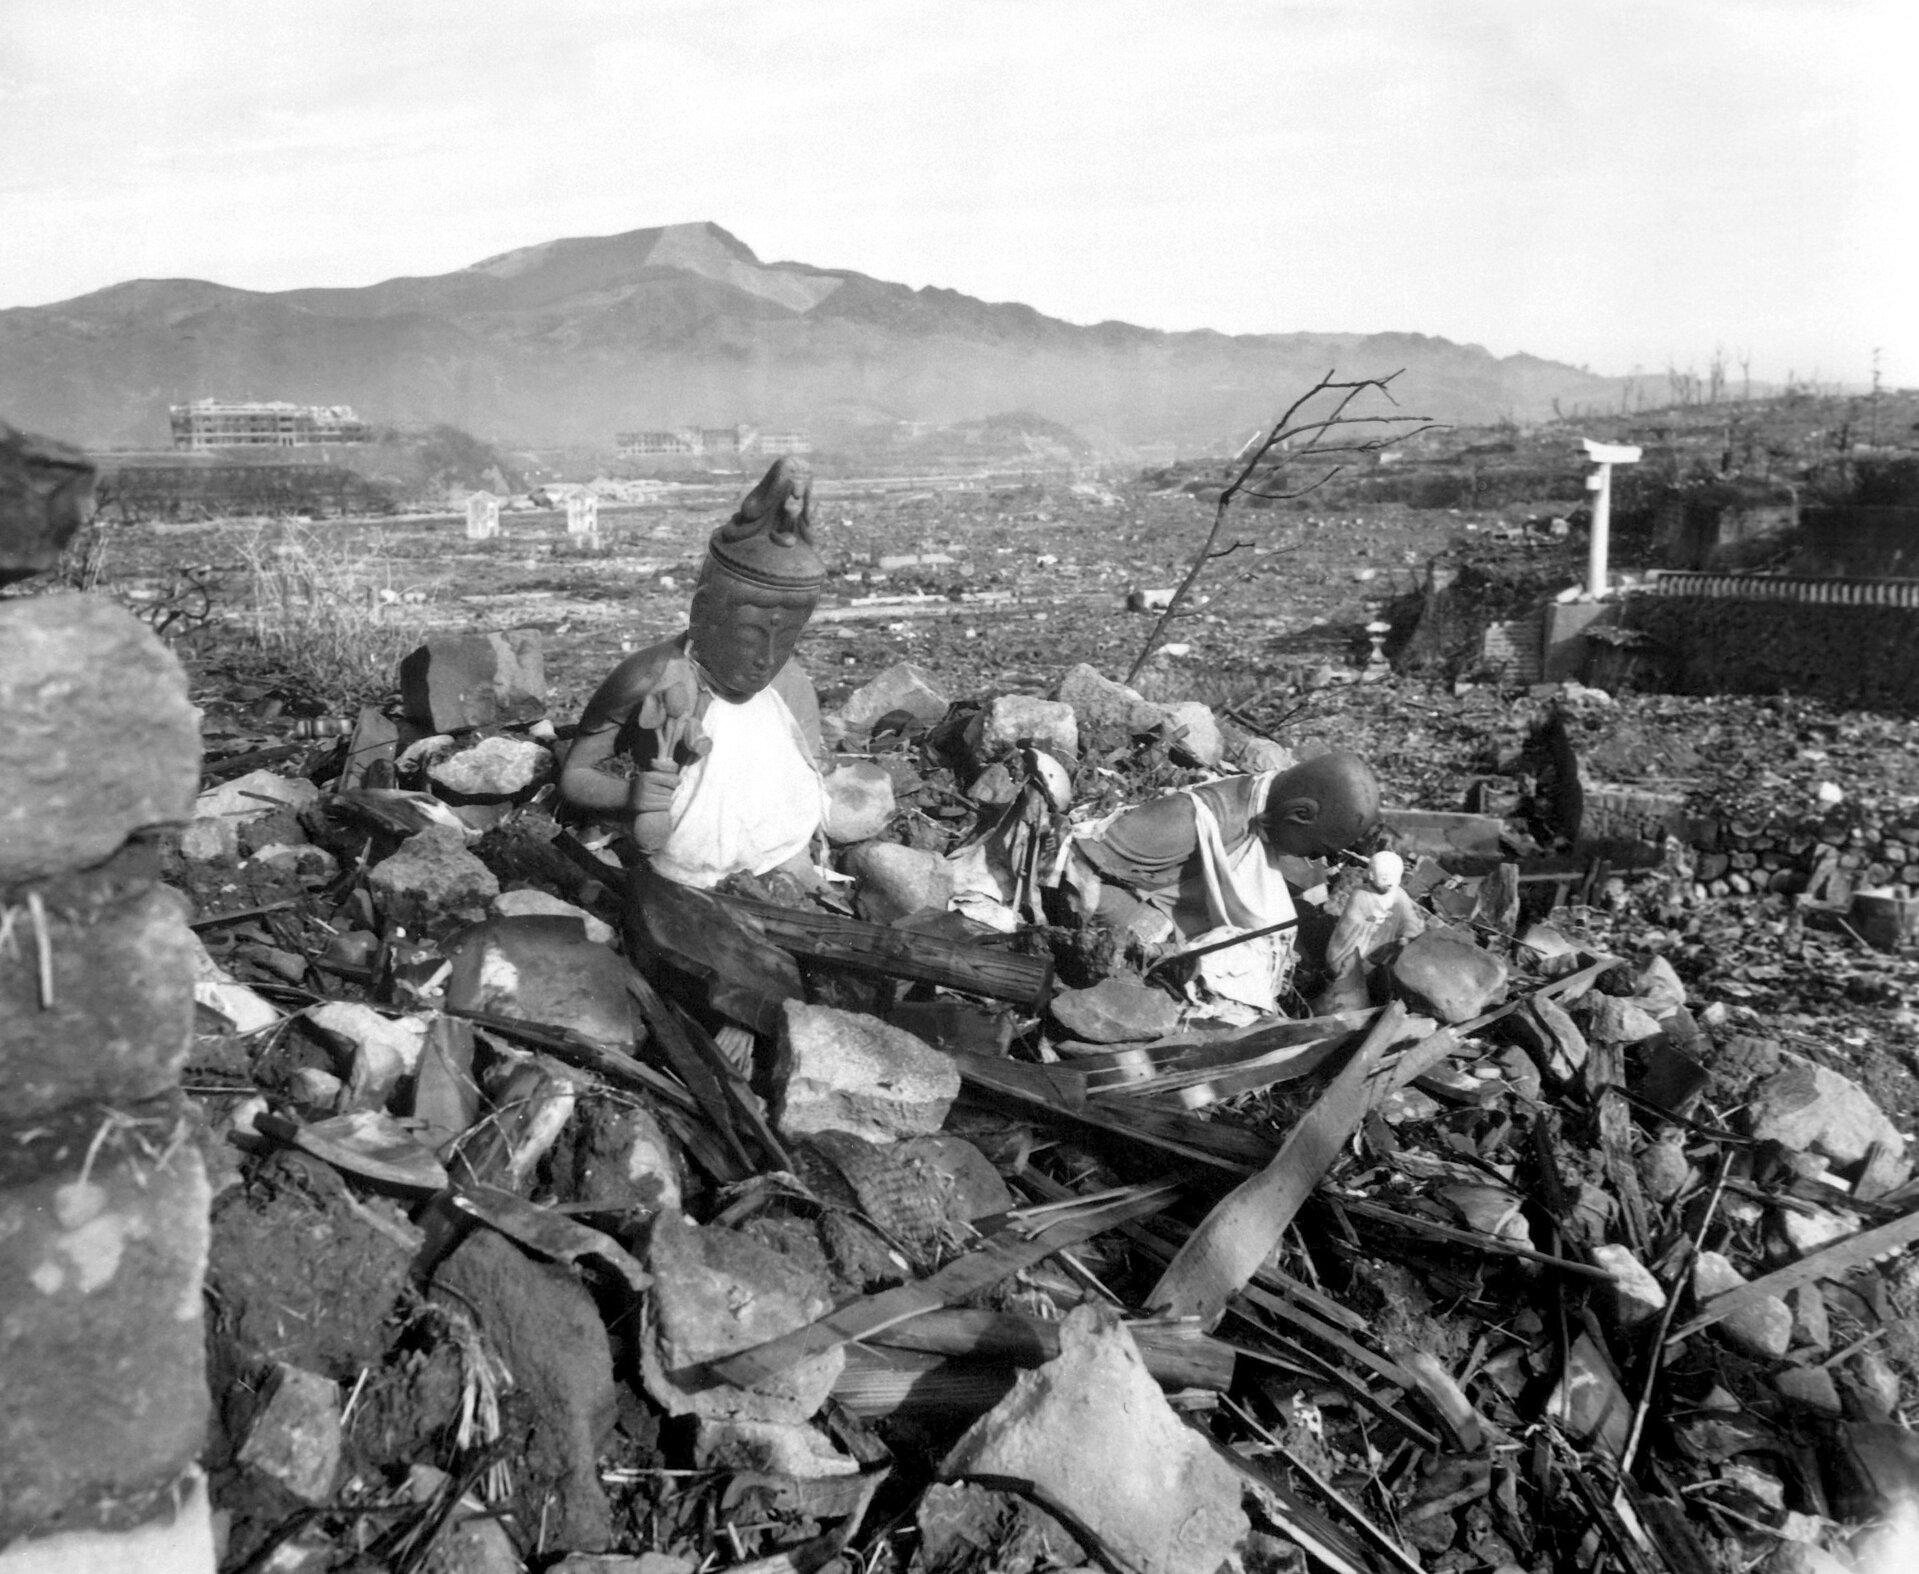 Ruiny Nagasaki po wymuchu bomby atomowej Zdjęcie nr 3 Źródło: Cpl. Lynn P. Walker, Jr. (Marine Corps), Ruiny Nagasaki po wymuchu bomby atomowej, licencja: CC 0.